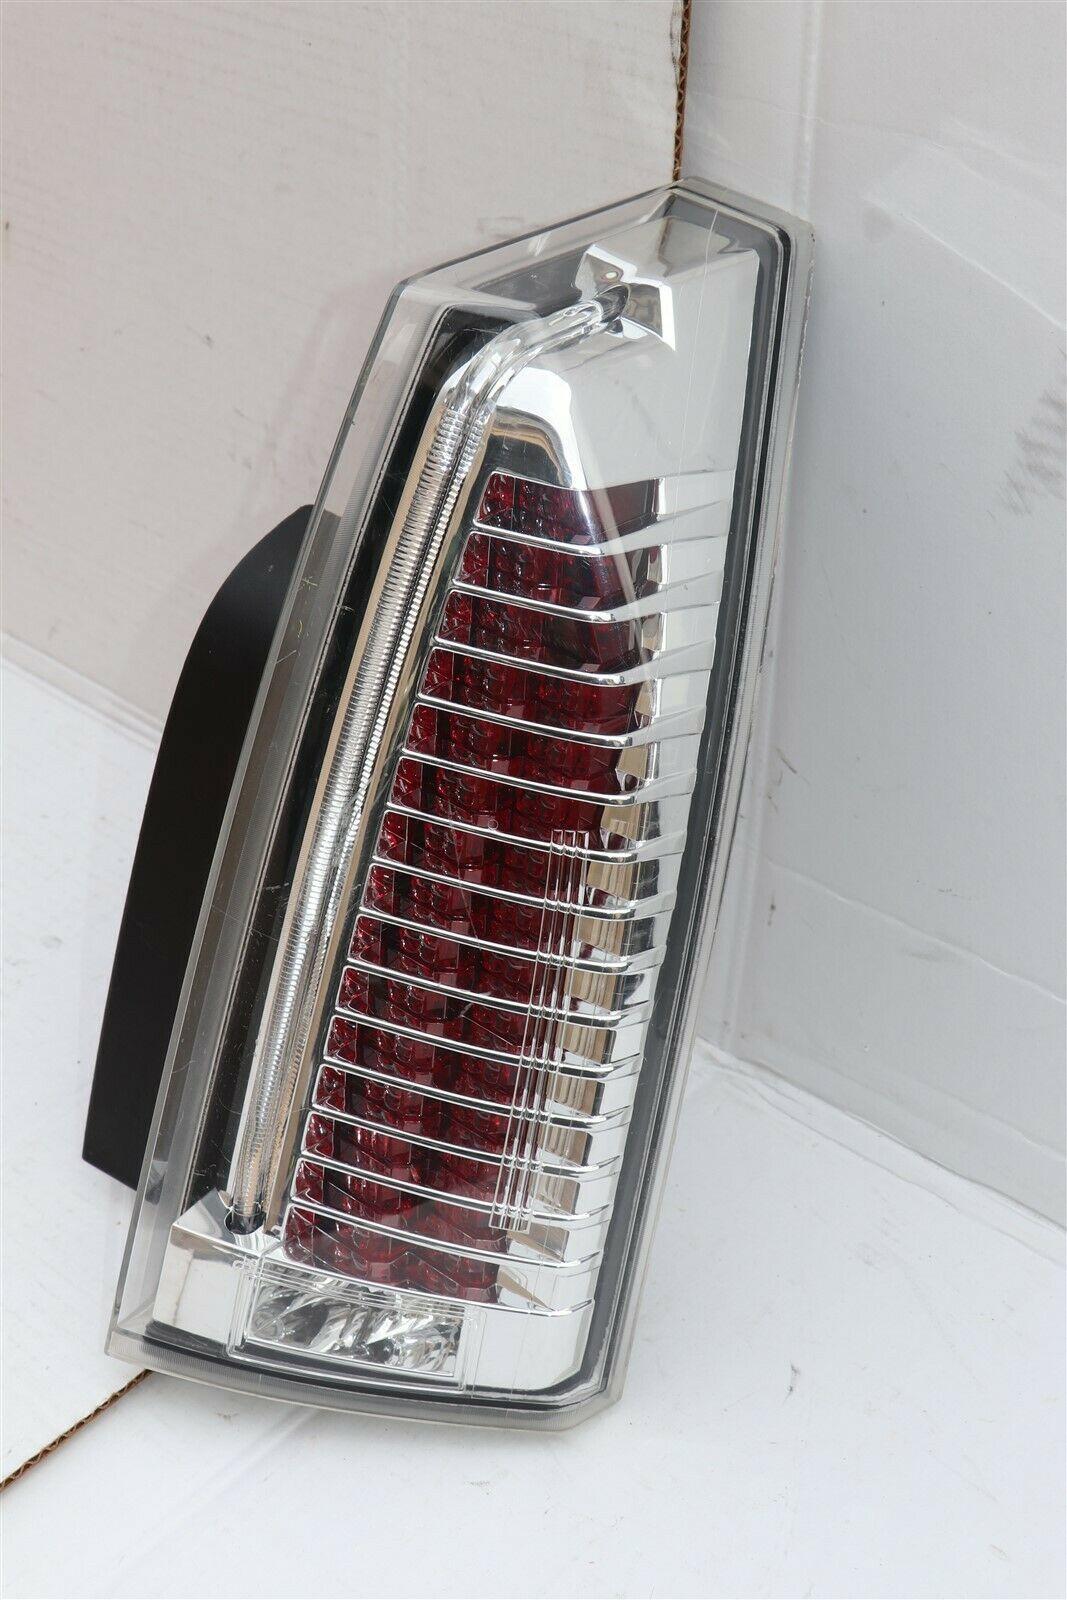 08-13 Cadillac CTS 4 door Sedan Euro LED Rear Tail Light Lamp Passenger Right RH